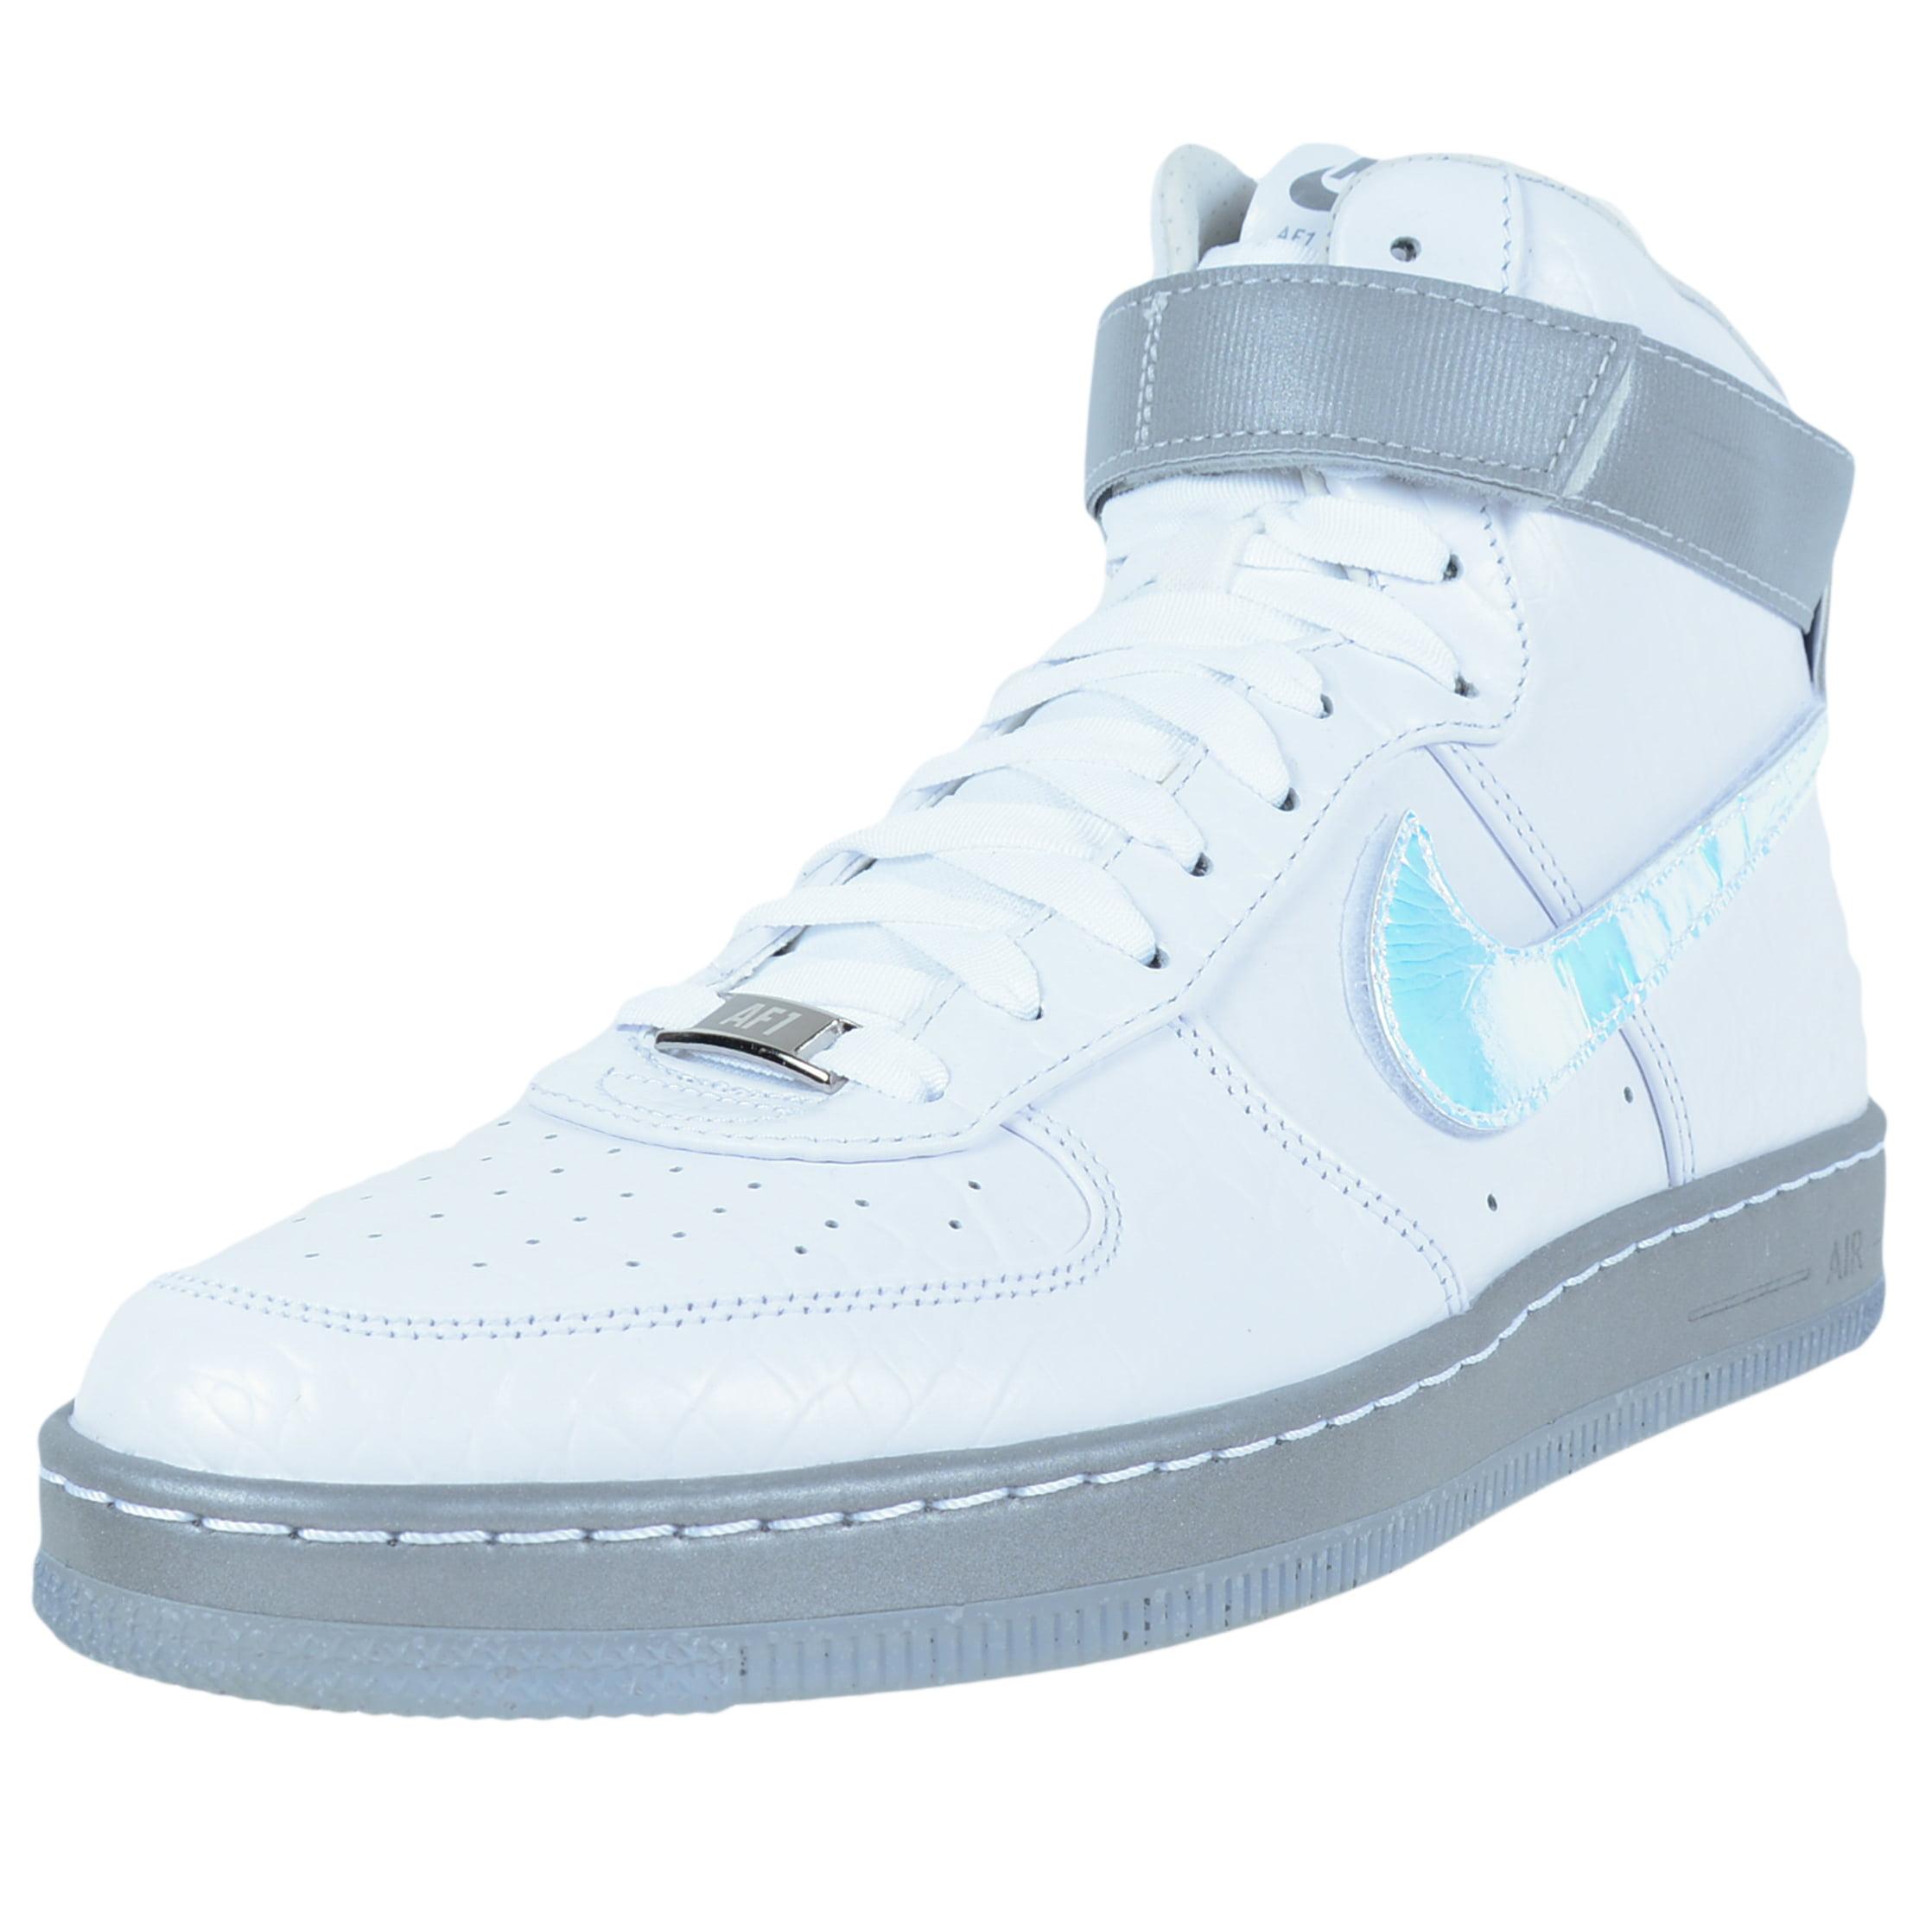 brand new 84332 1e937 ... shop nike air force 1 downtown hi lw qs hologram white white 632360 100  8dadc 90bae